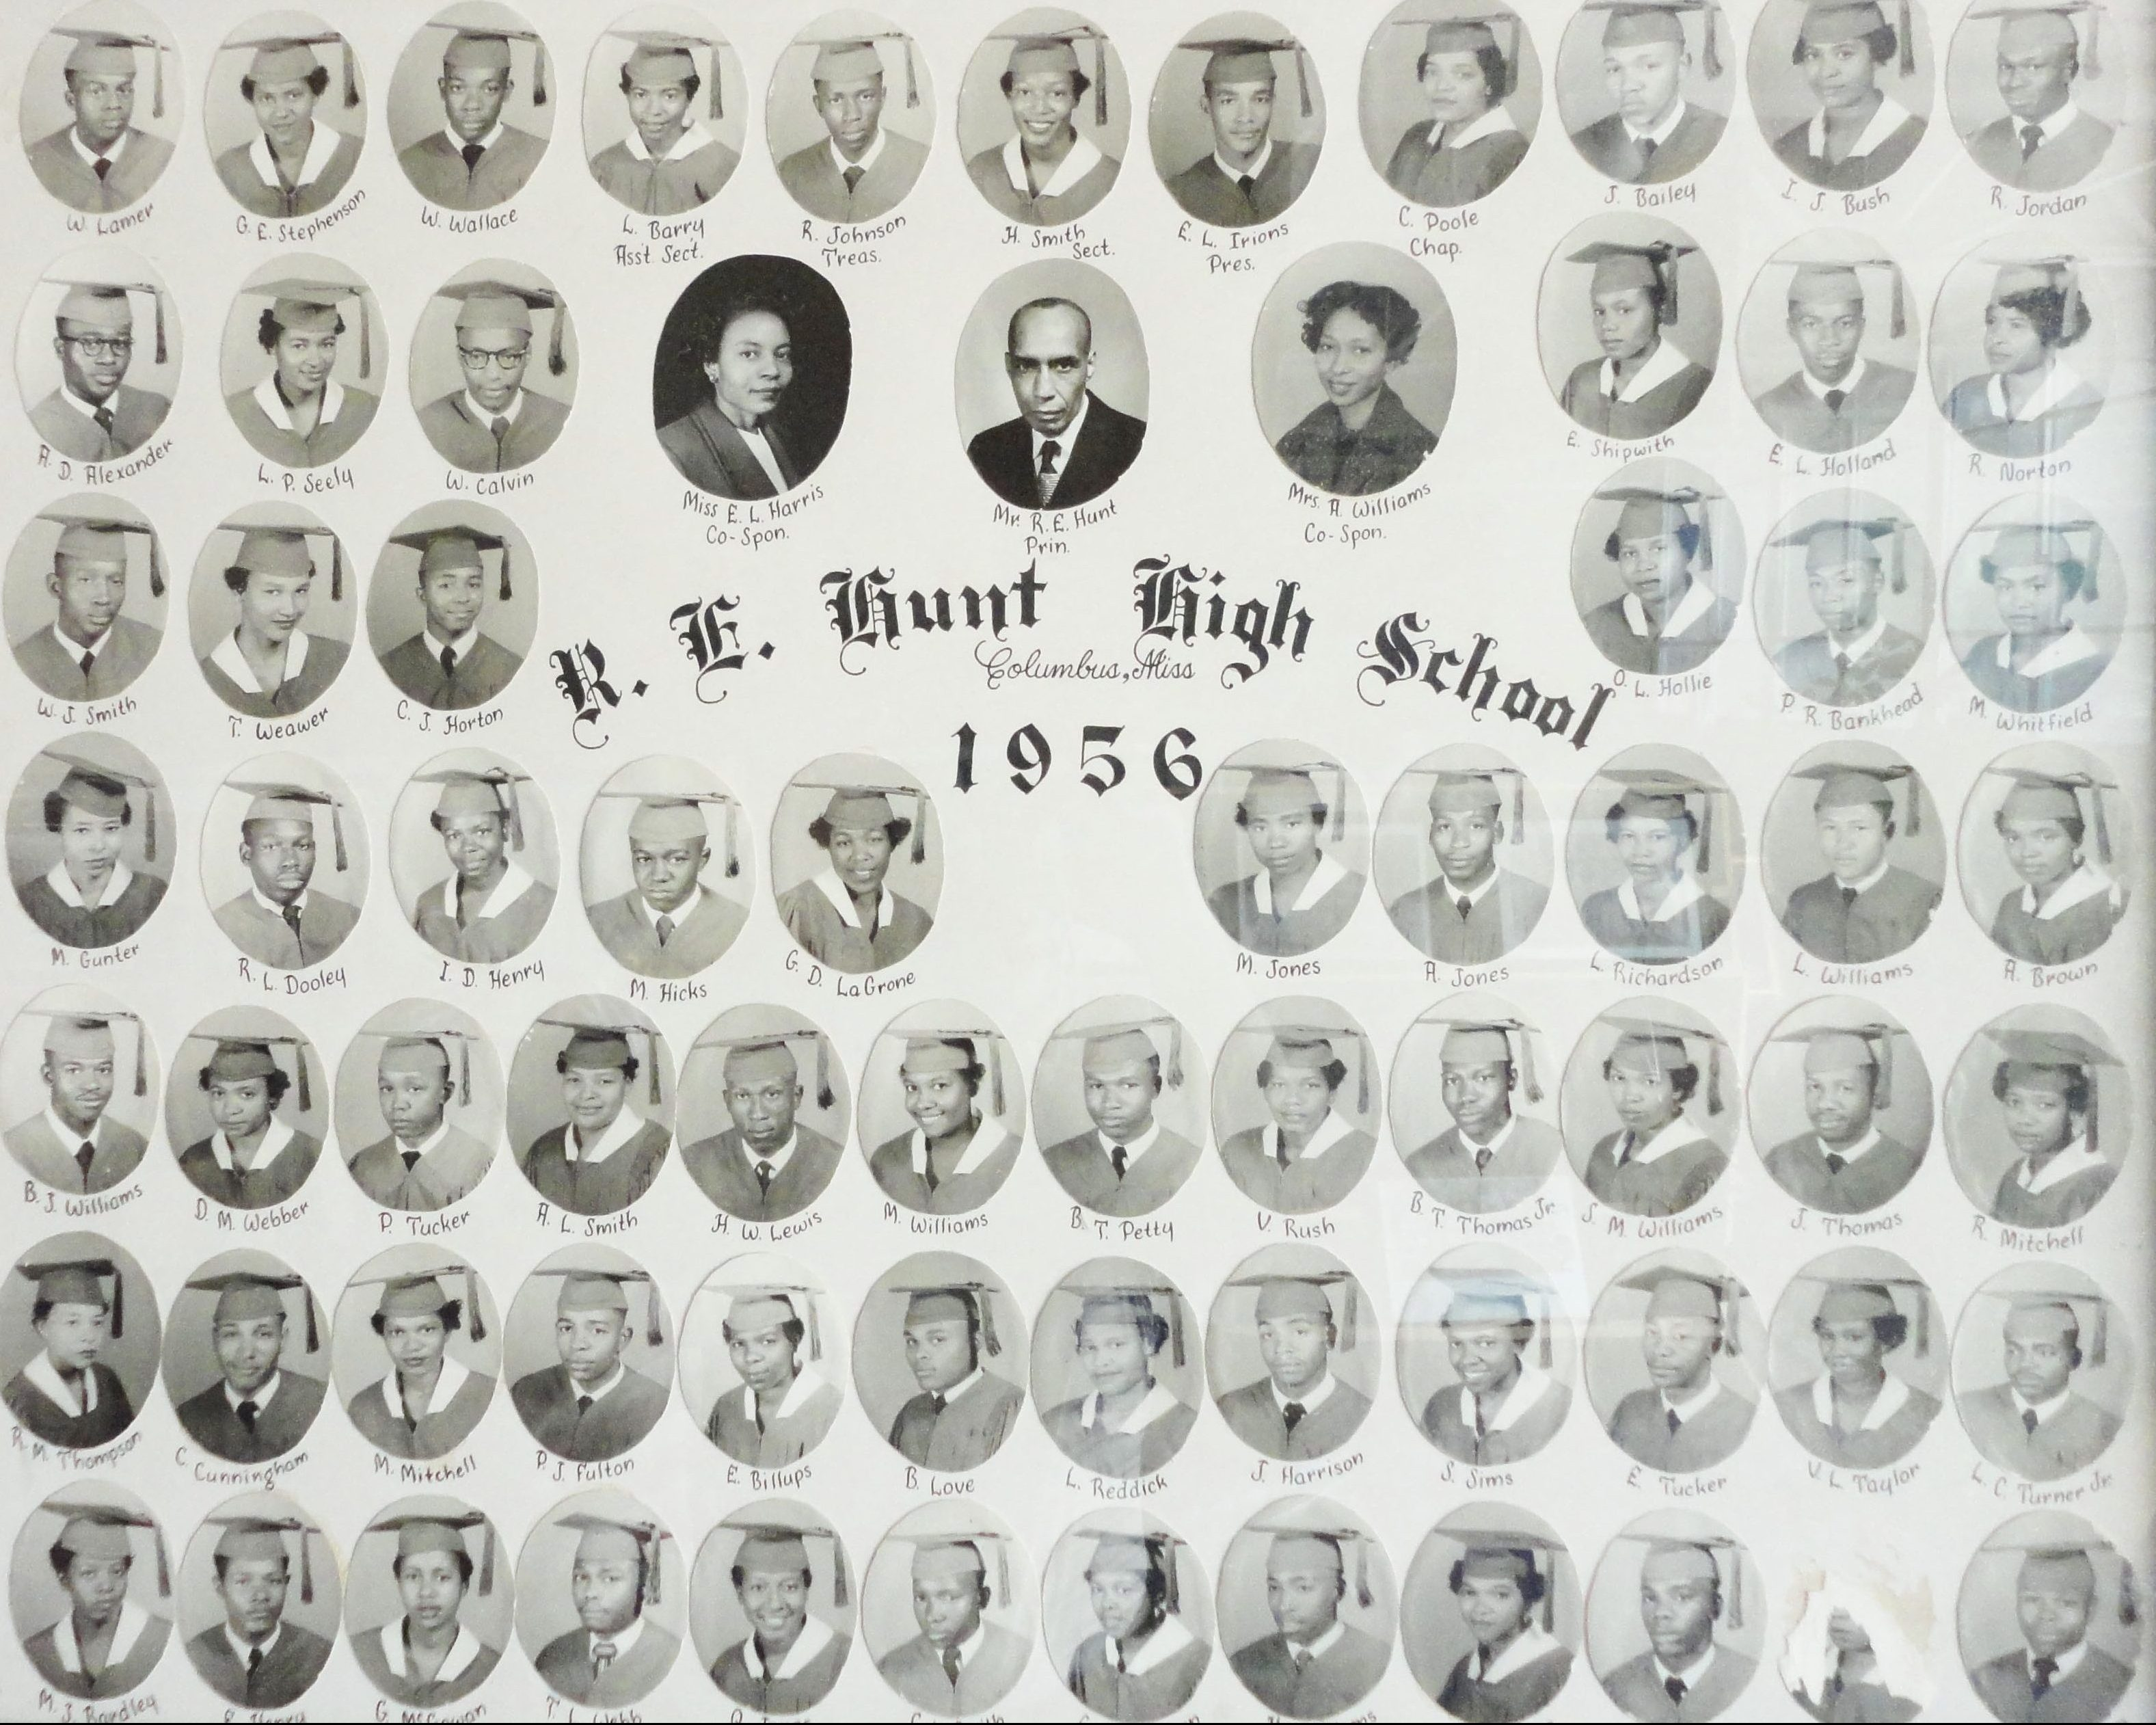 Class 1956